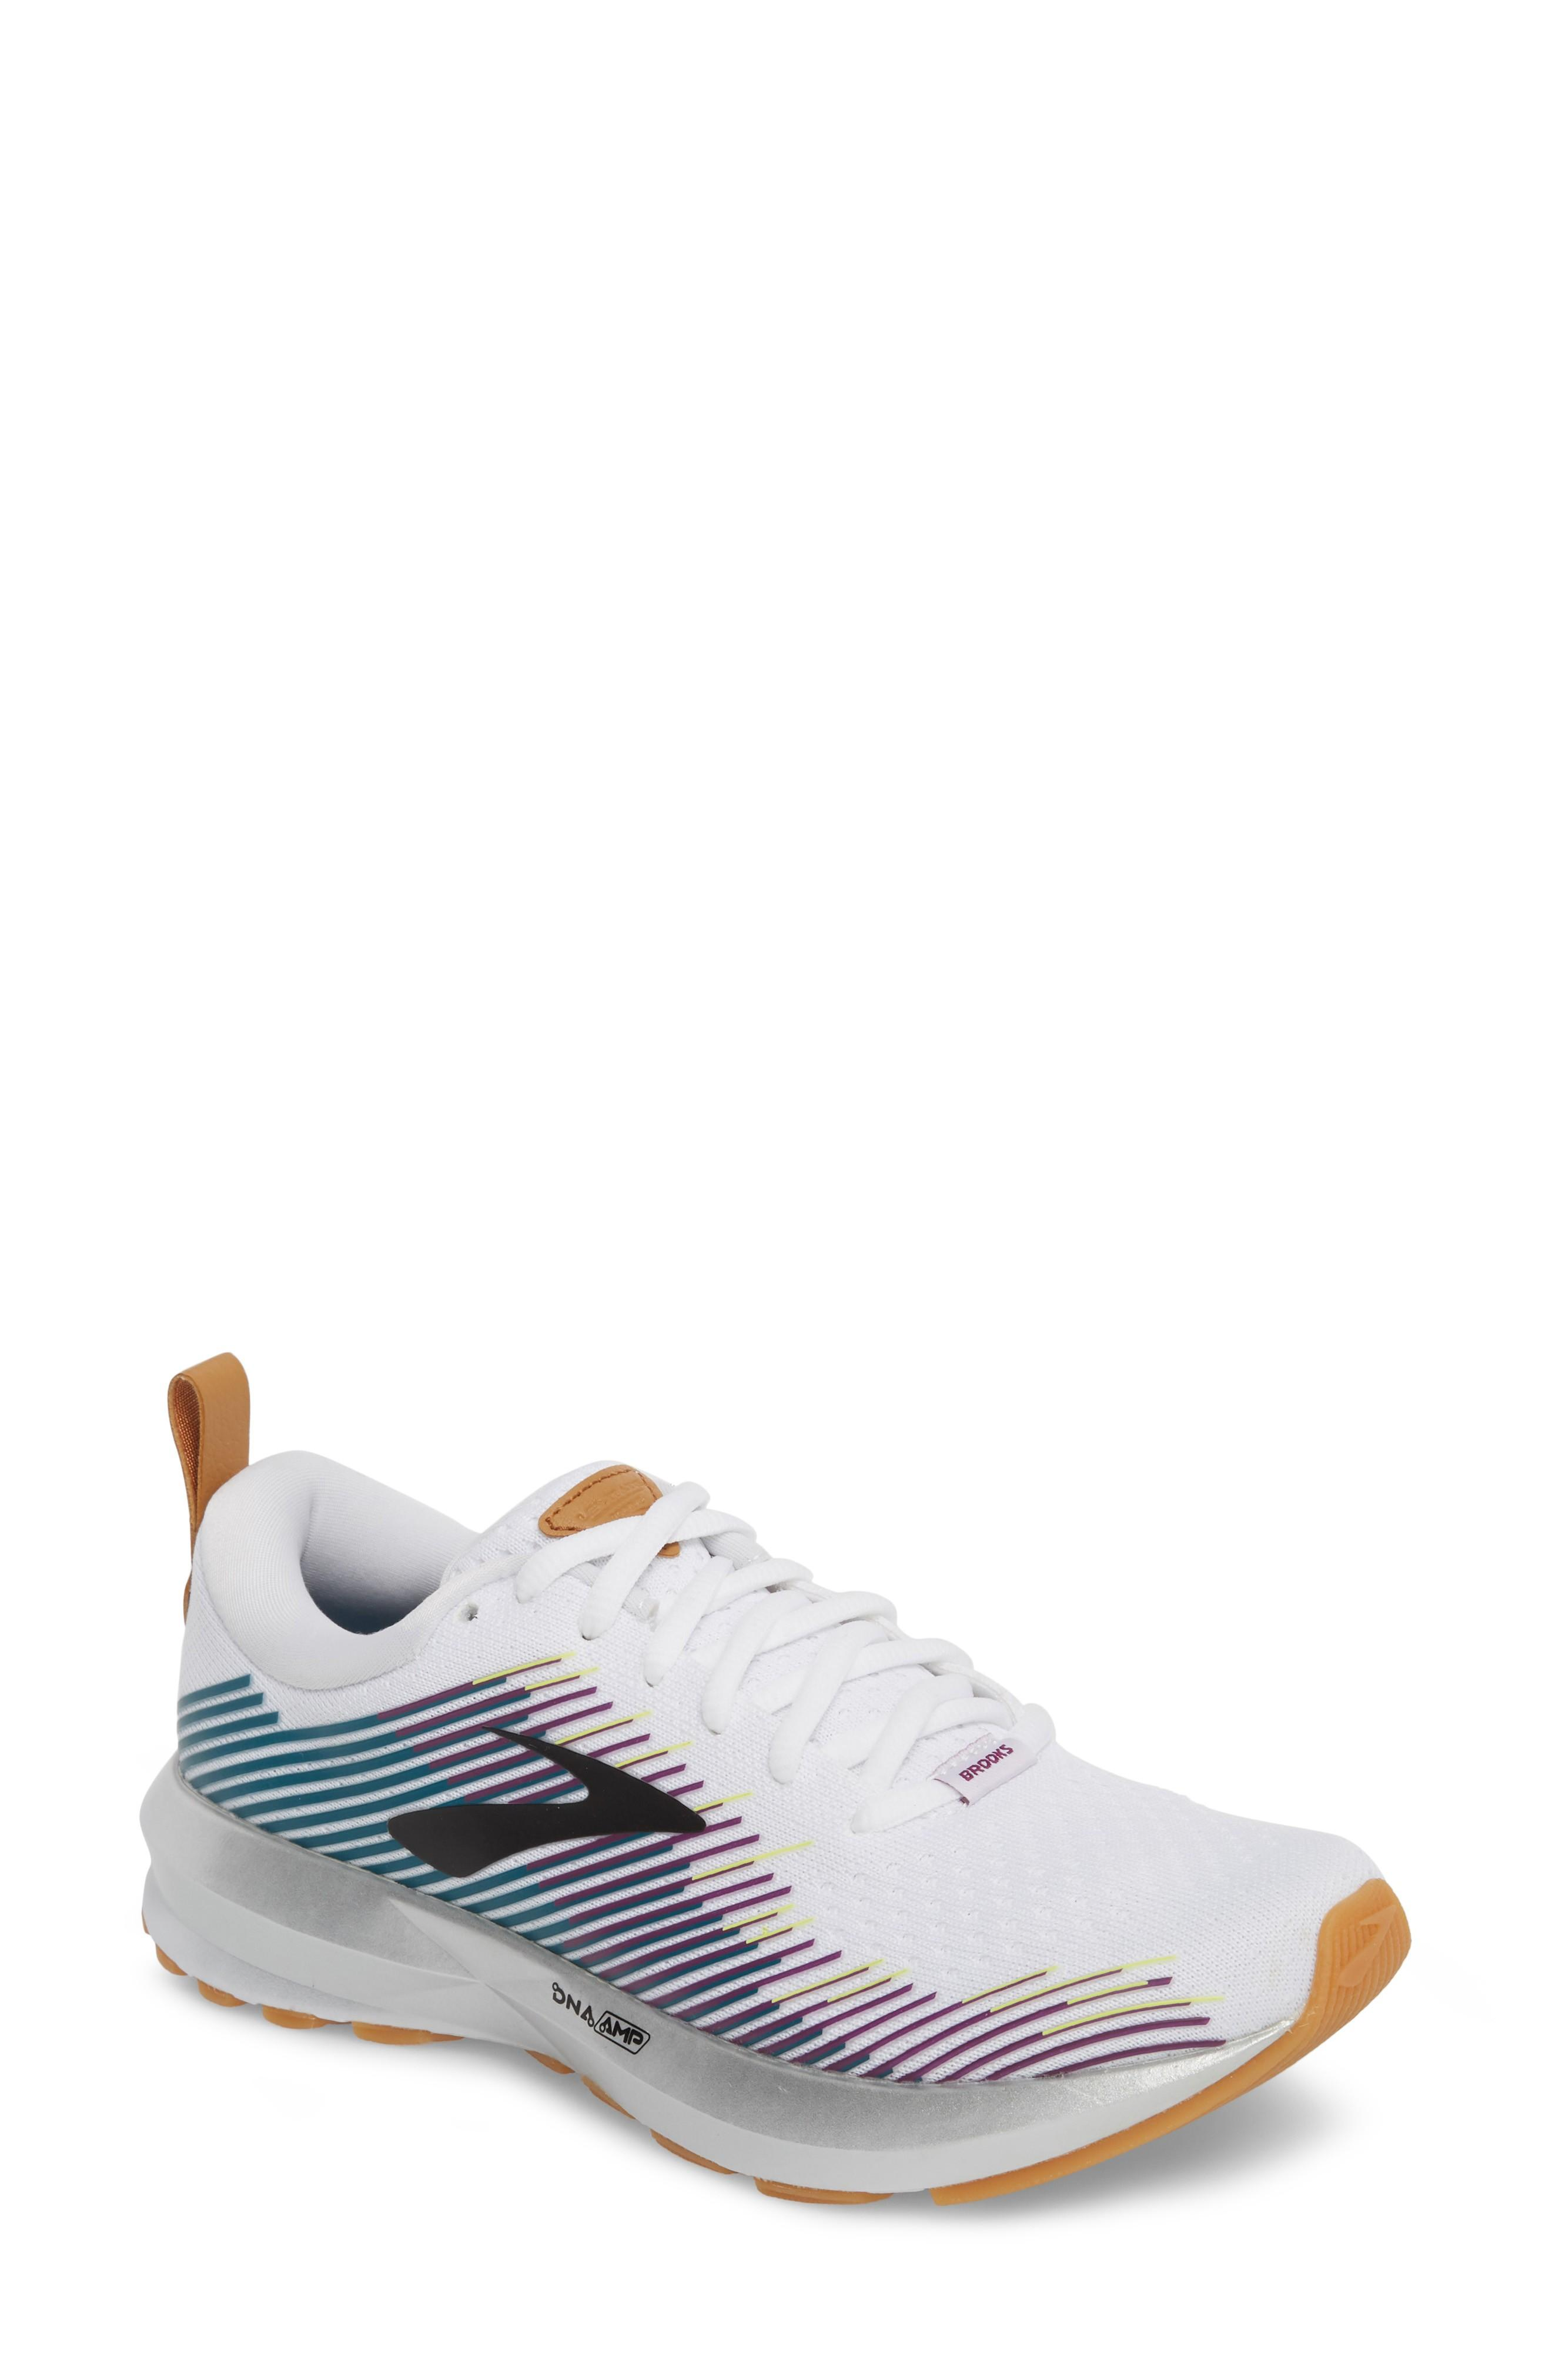 228618c1d65a2 Brooks Women s Levitate Running Shoes